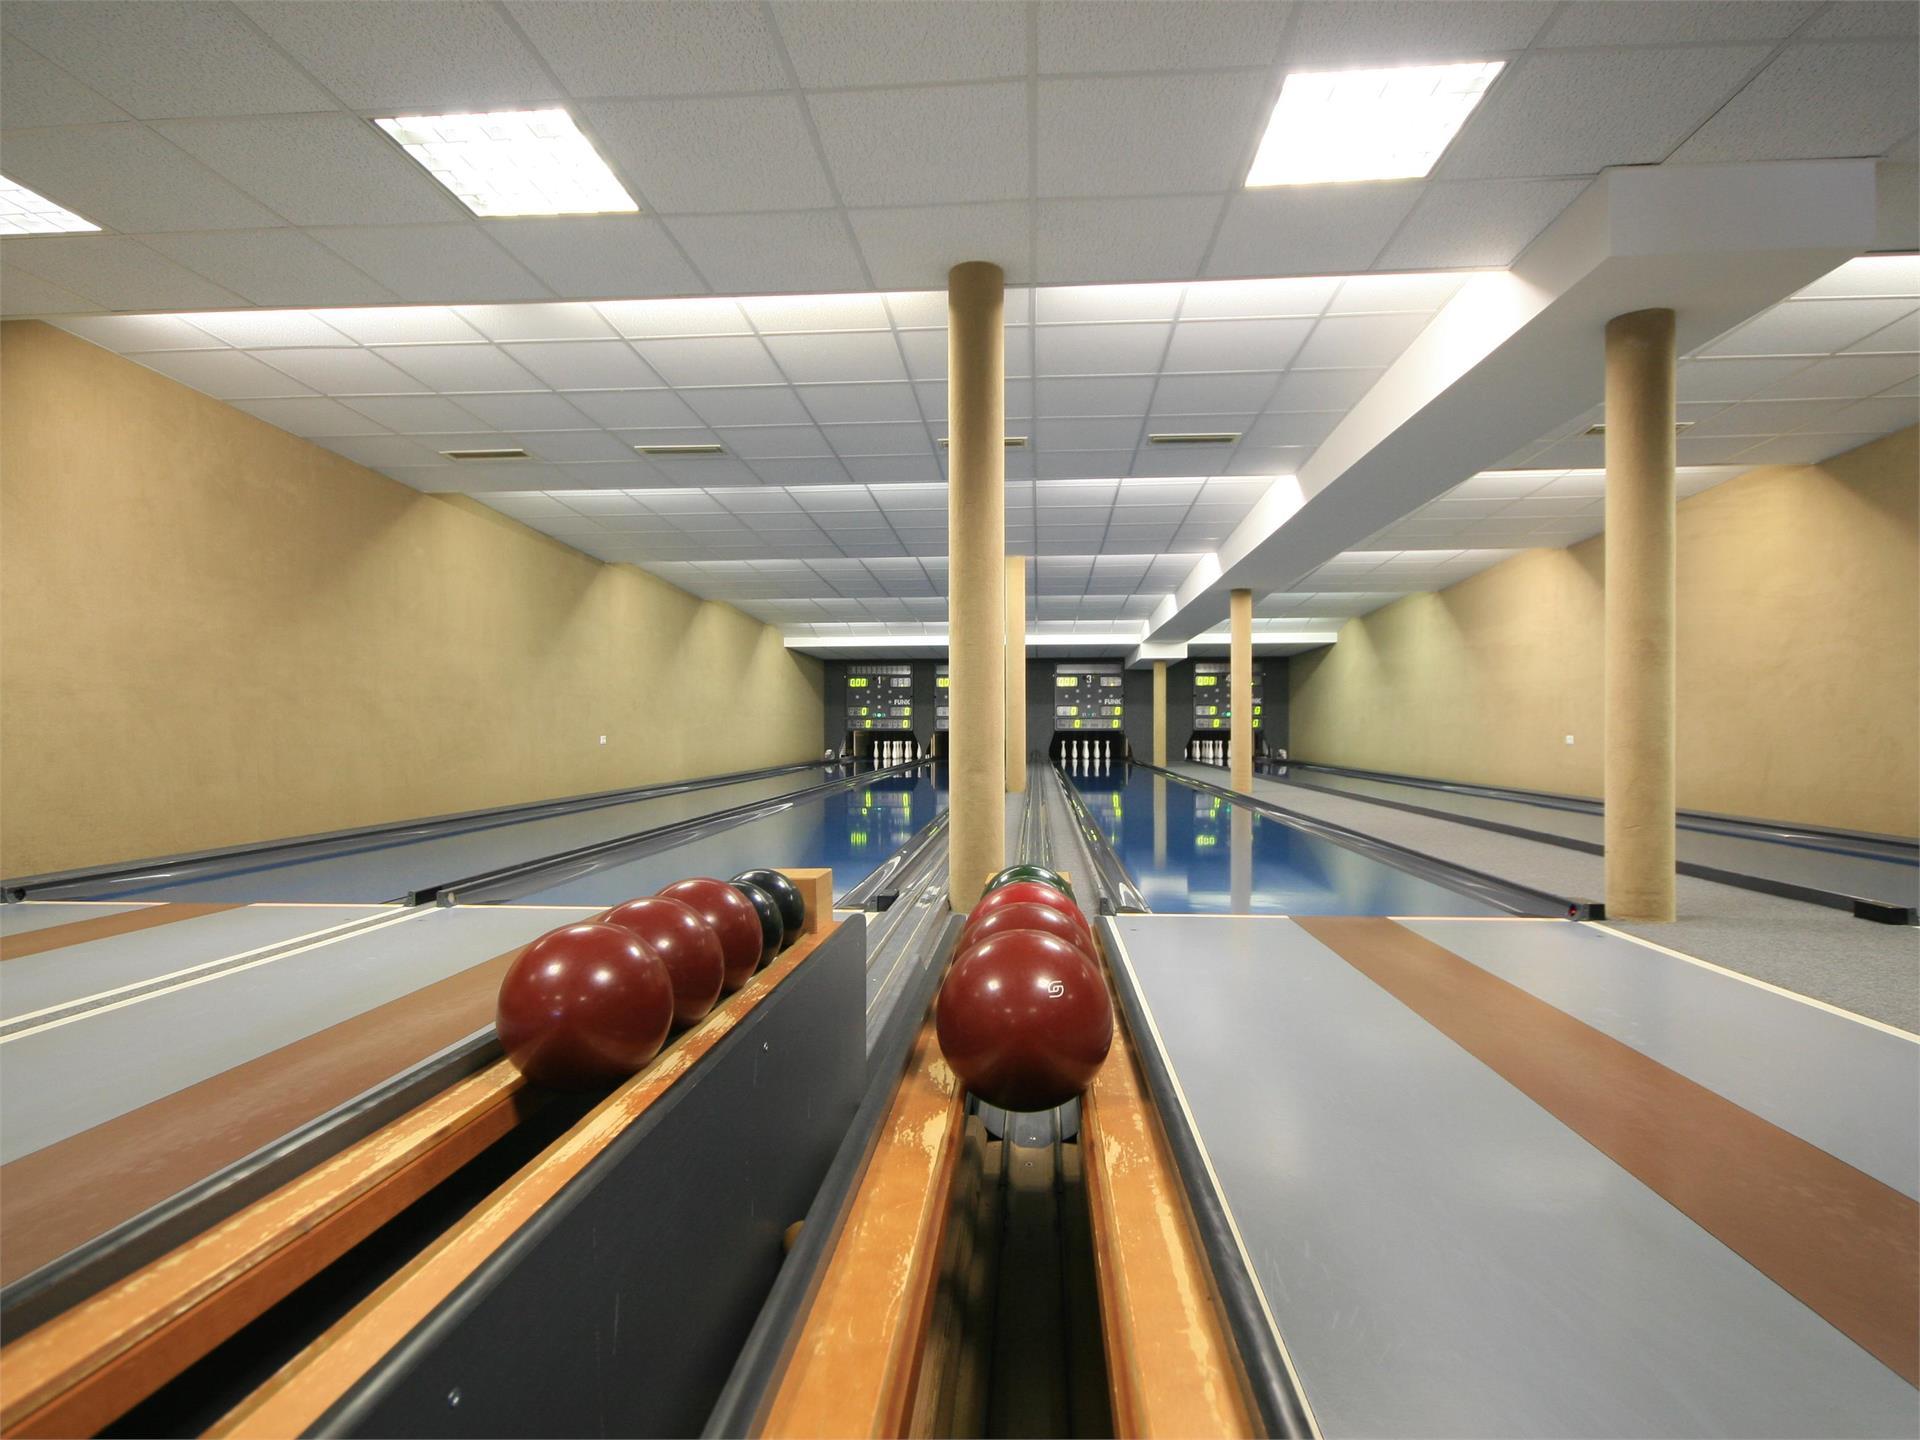 Bowling Alley Dorf Tirol/Tirolo